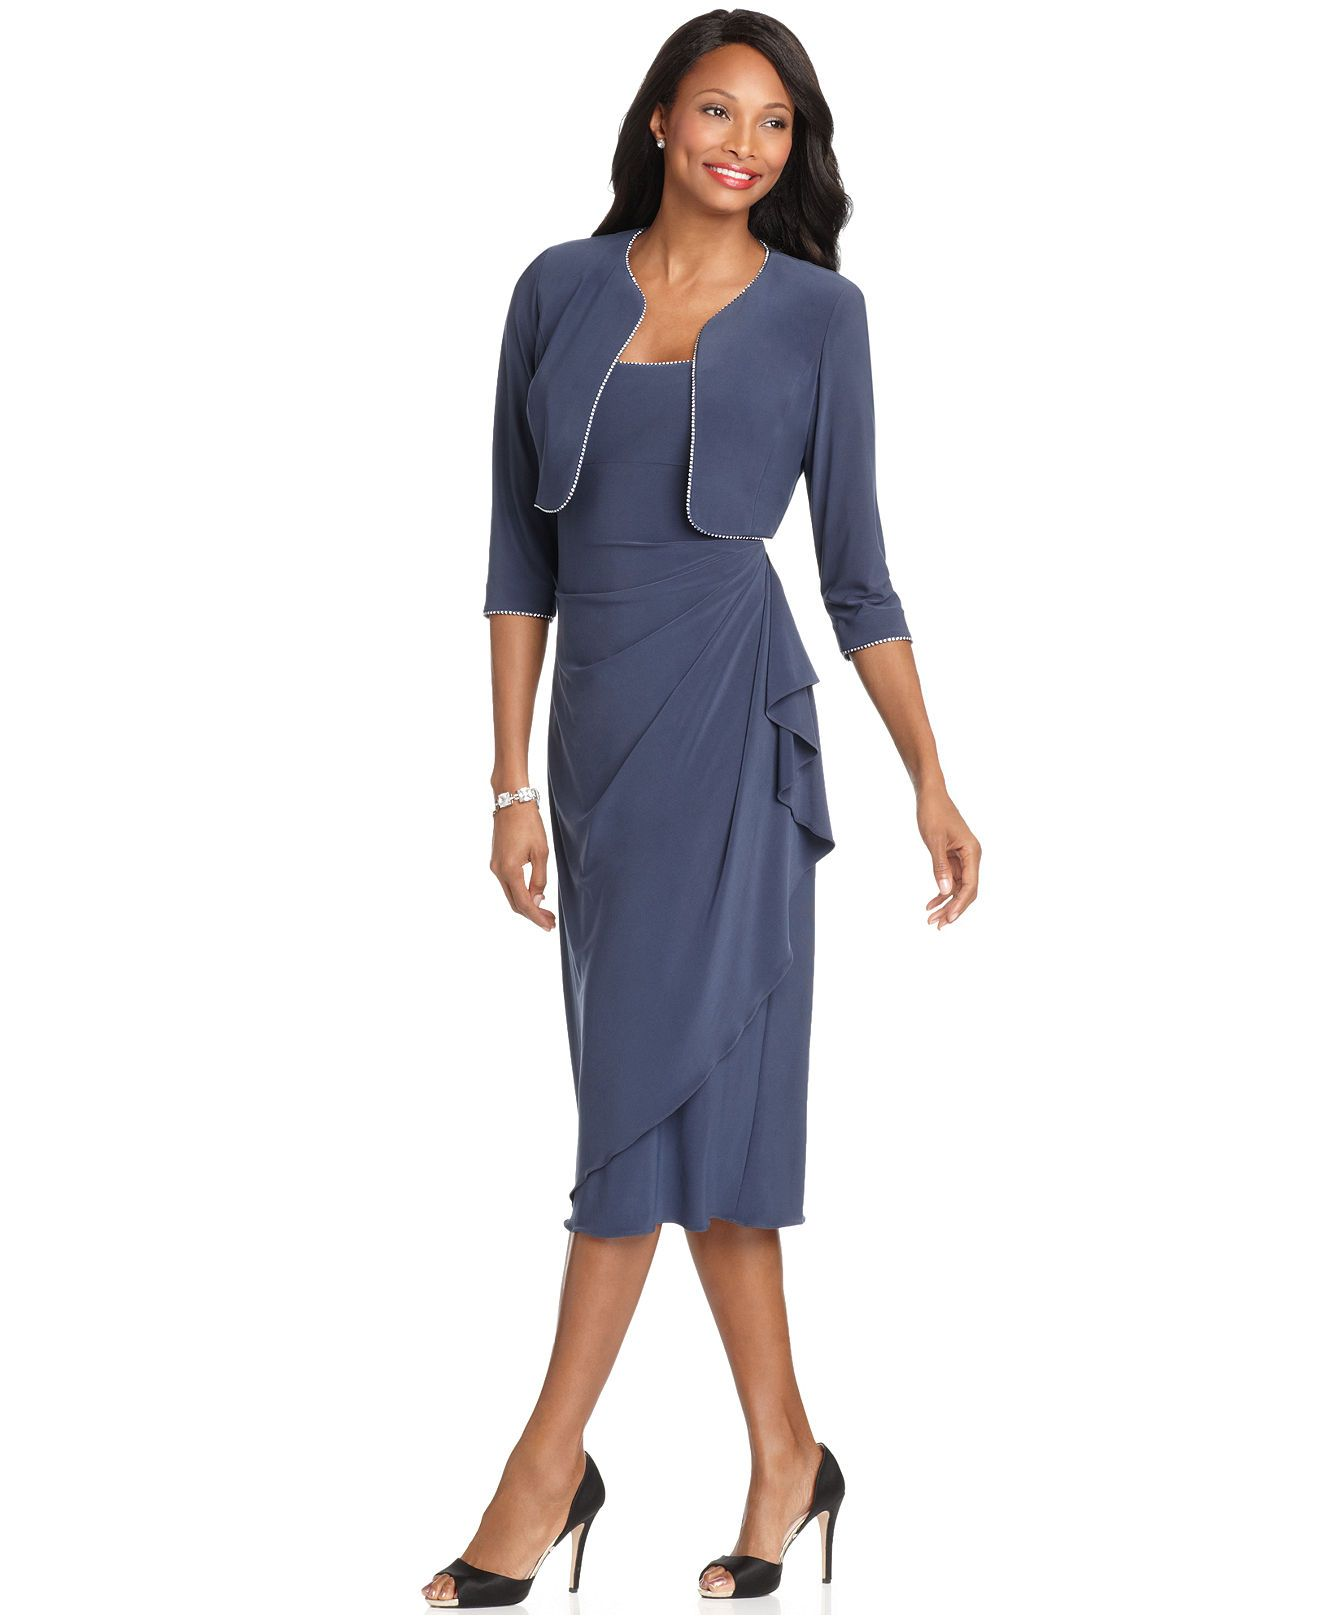 Macy's Alex Evenings Dress and Jacke-$189